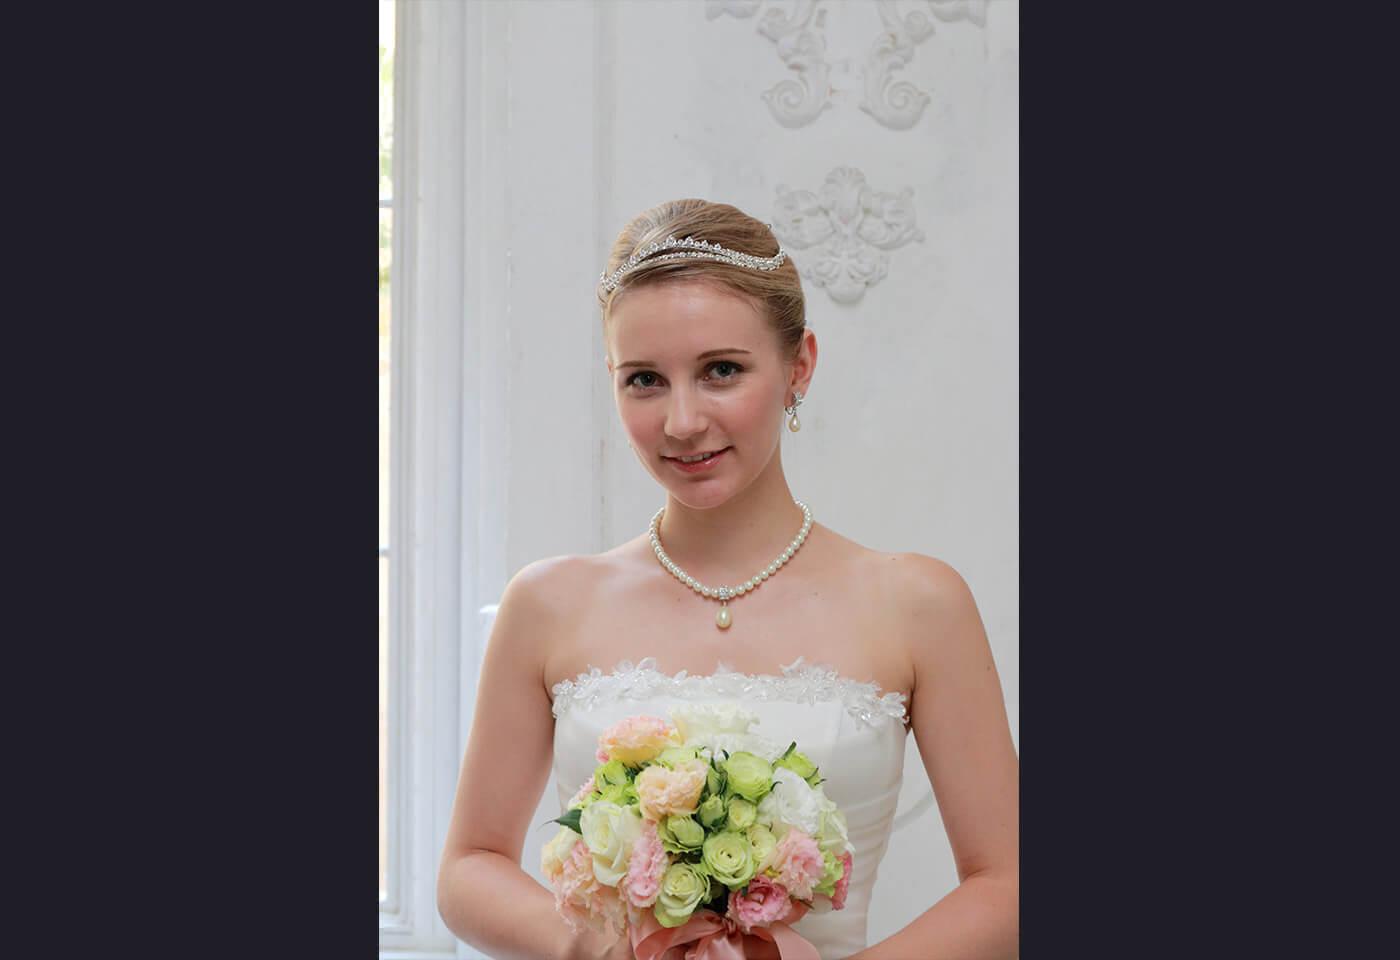 Bridal portrait using Canon Speedlite 430EX III-RT flash